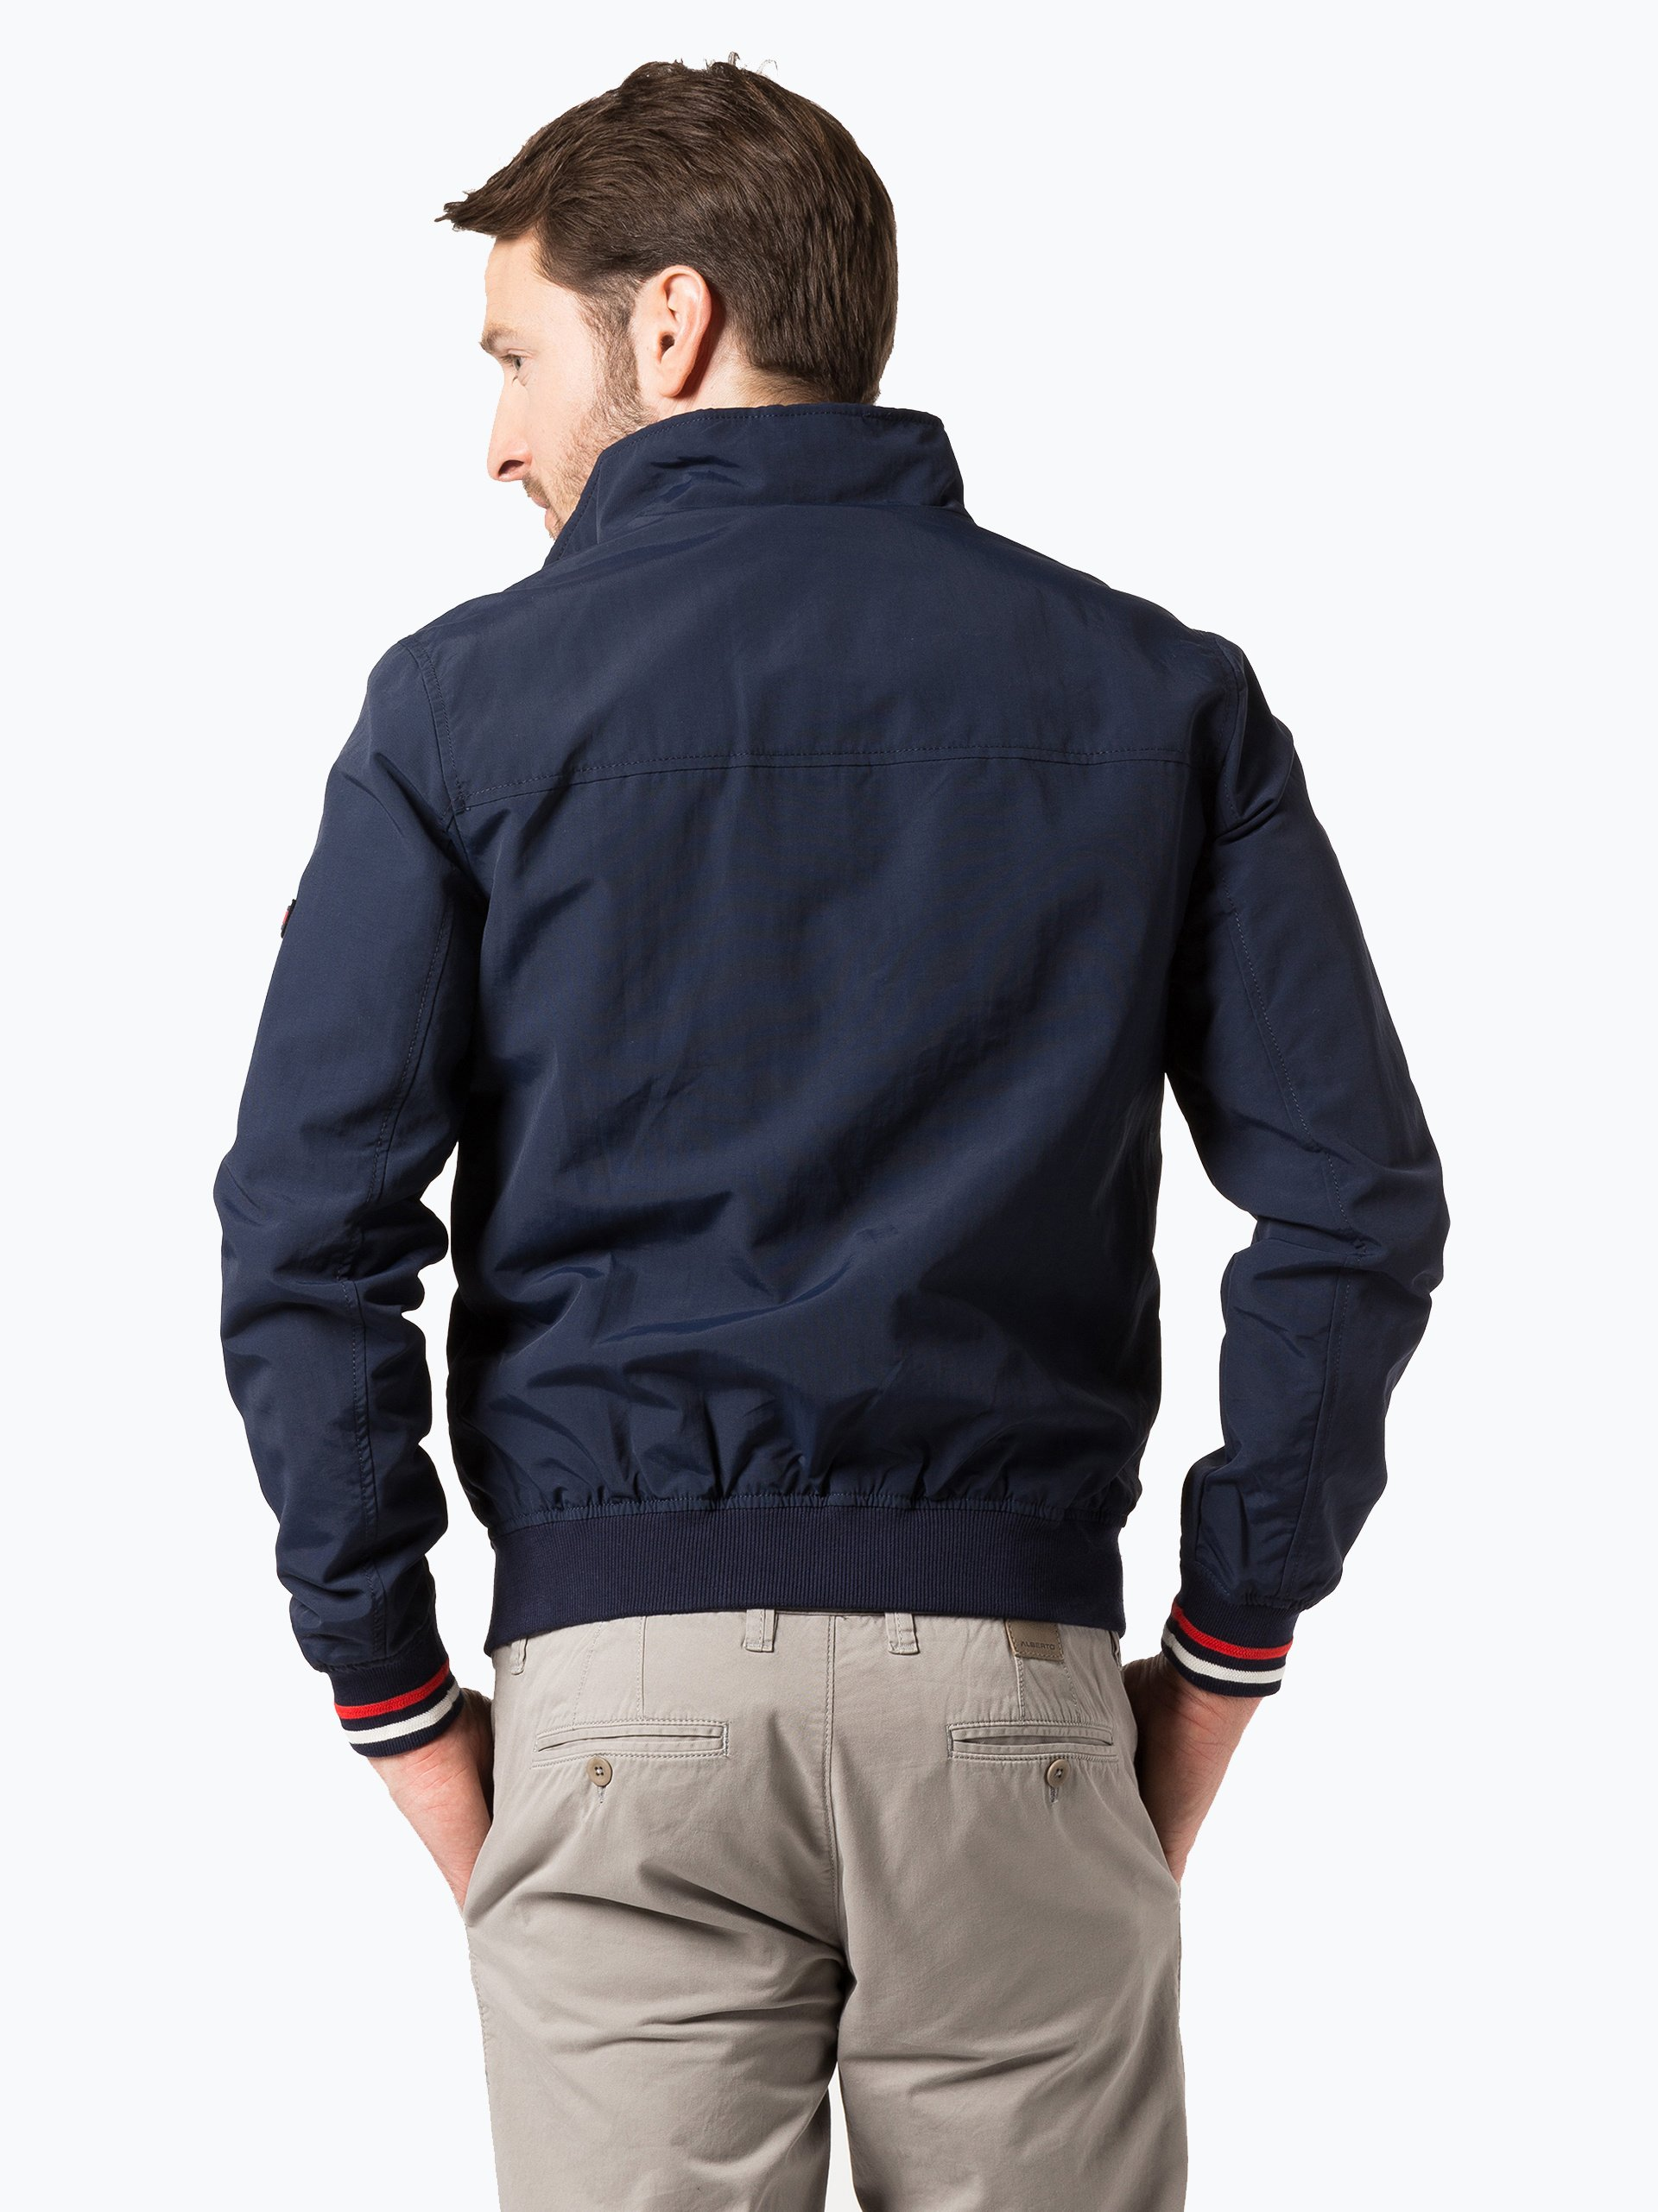 tommy jeans herren blouson marine uni online kaufen peek. Black Bedroom Furniture Sets. Home Design Ideas